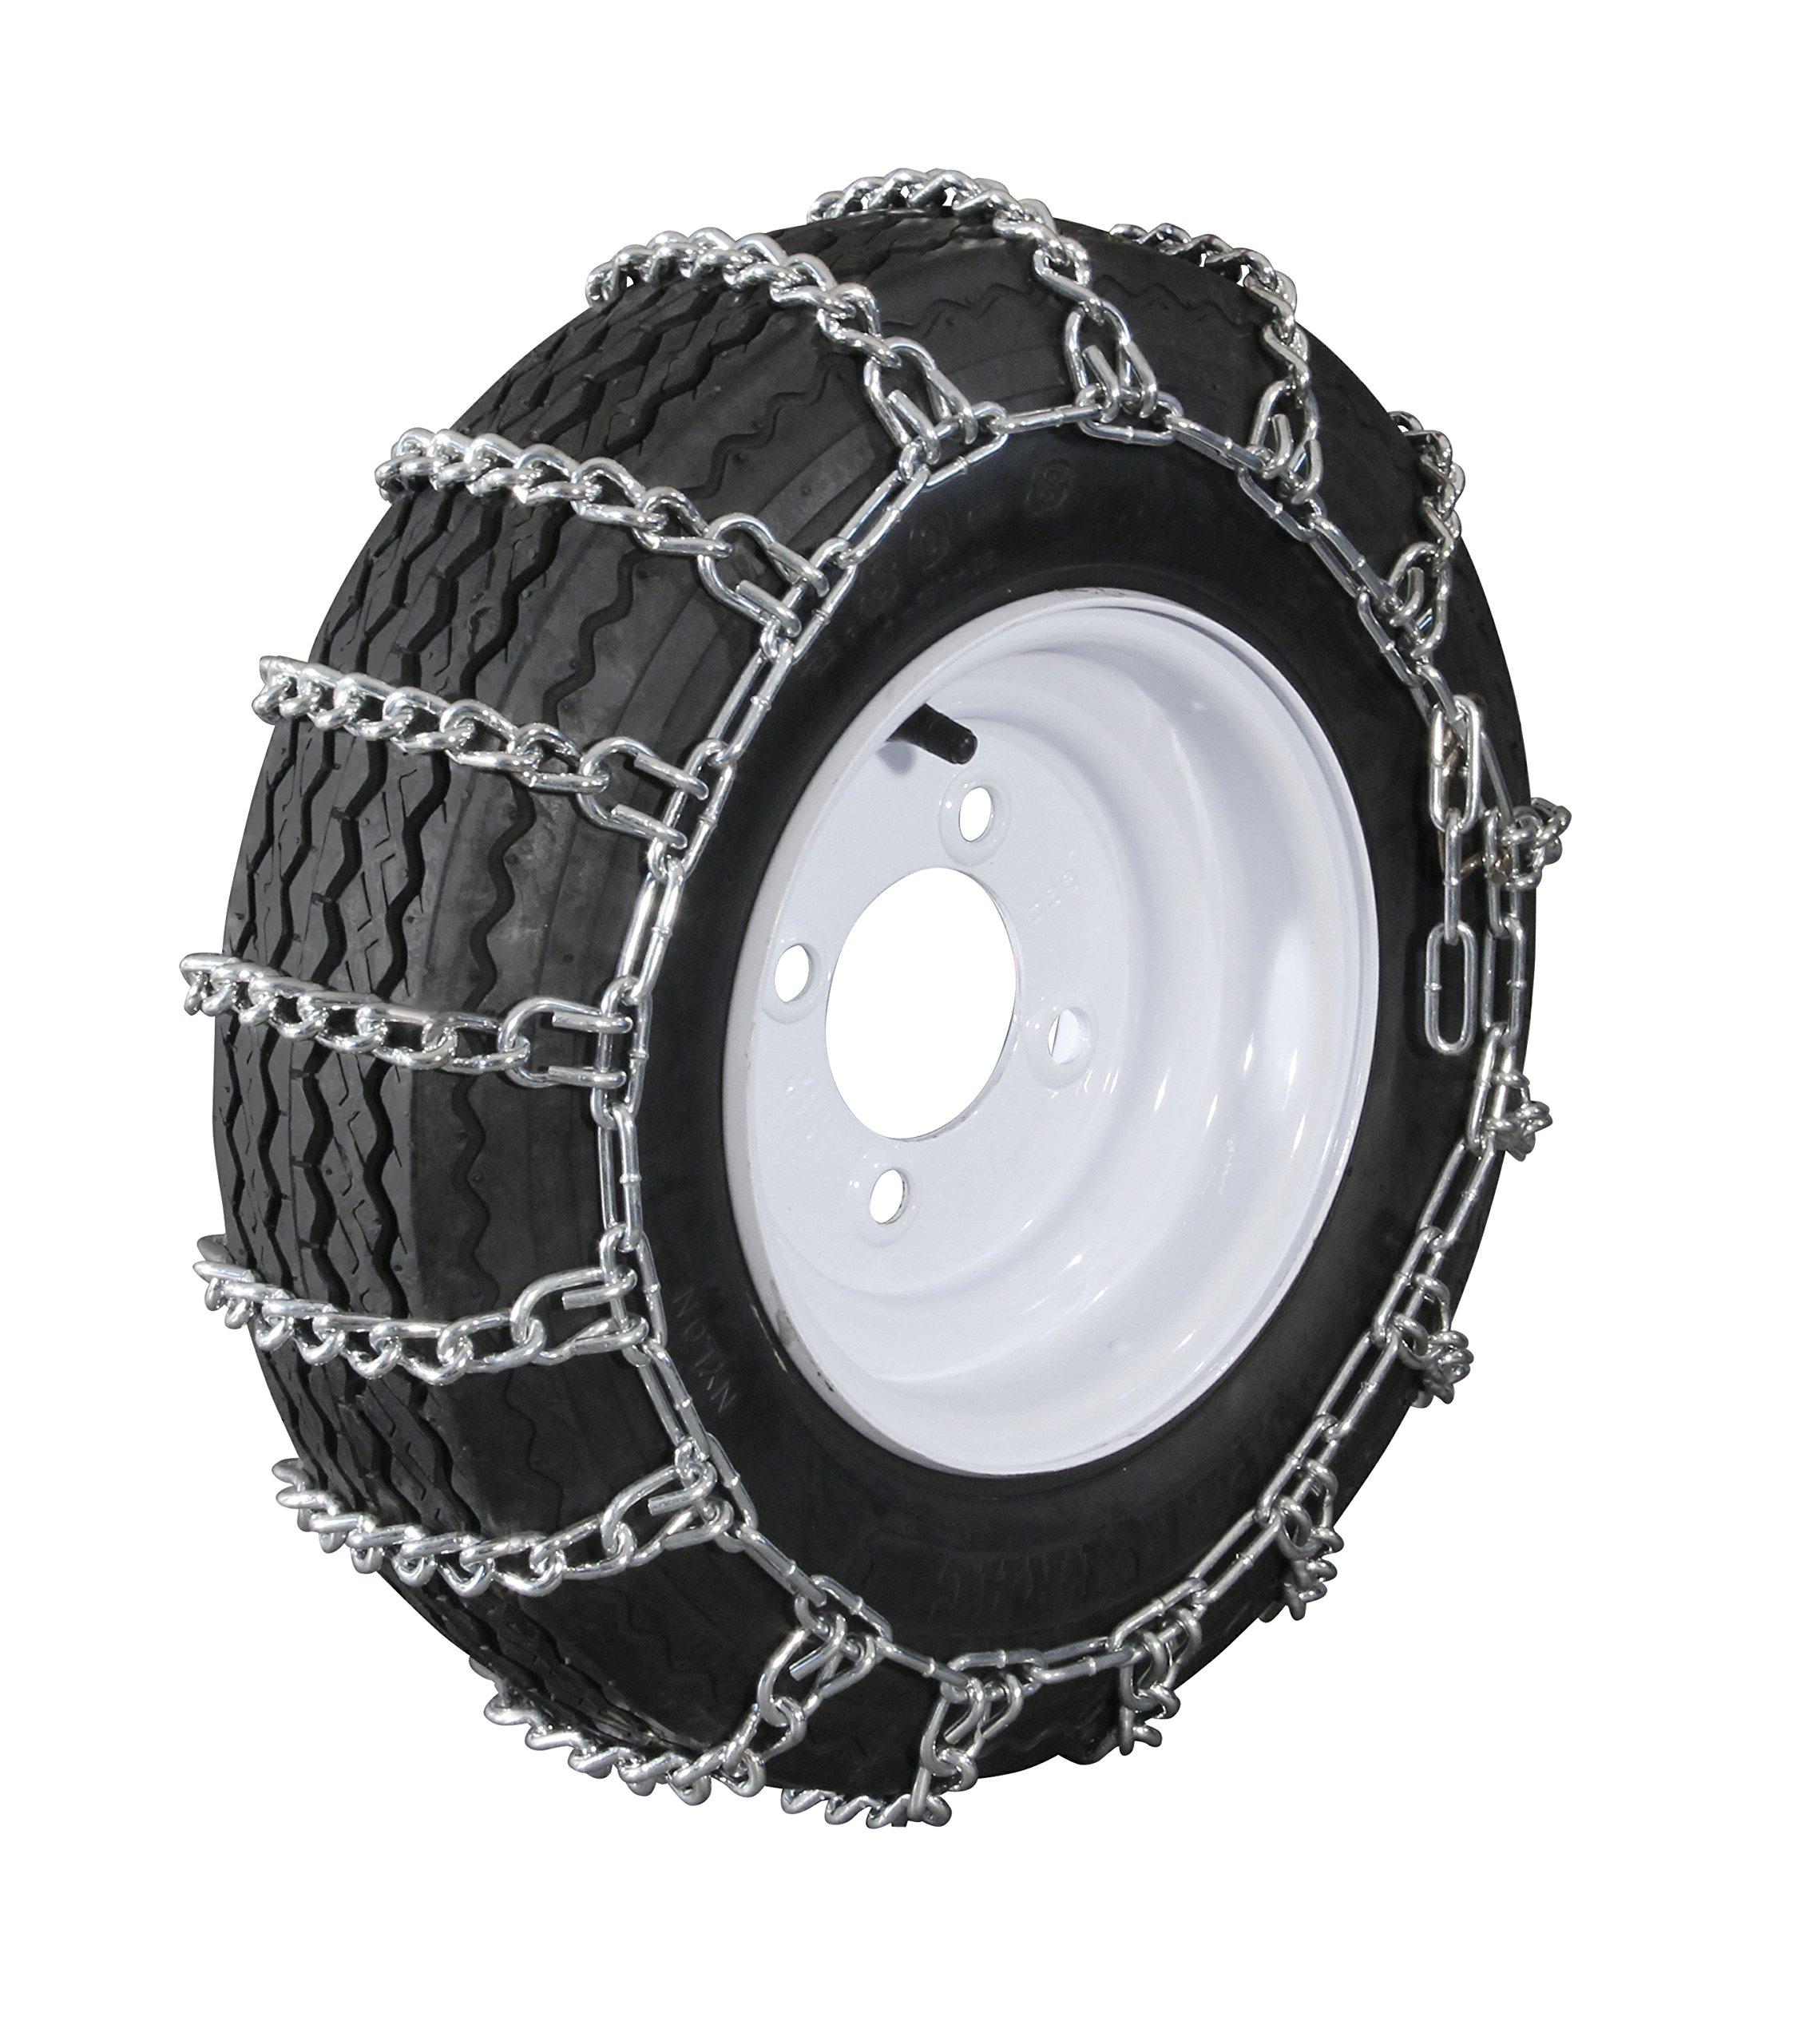 MaxTrac Peerless MTL-315 Garden Tractor 2 link Ladder Style Tire Chains 15x6.00-6